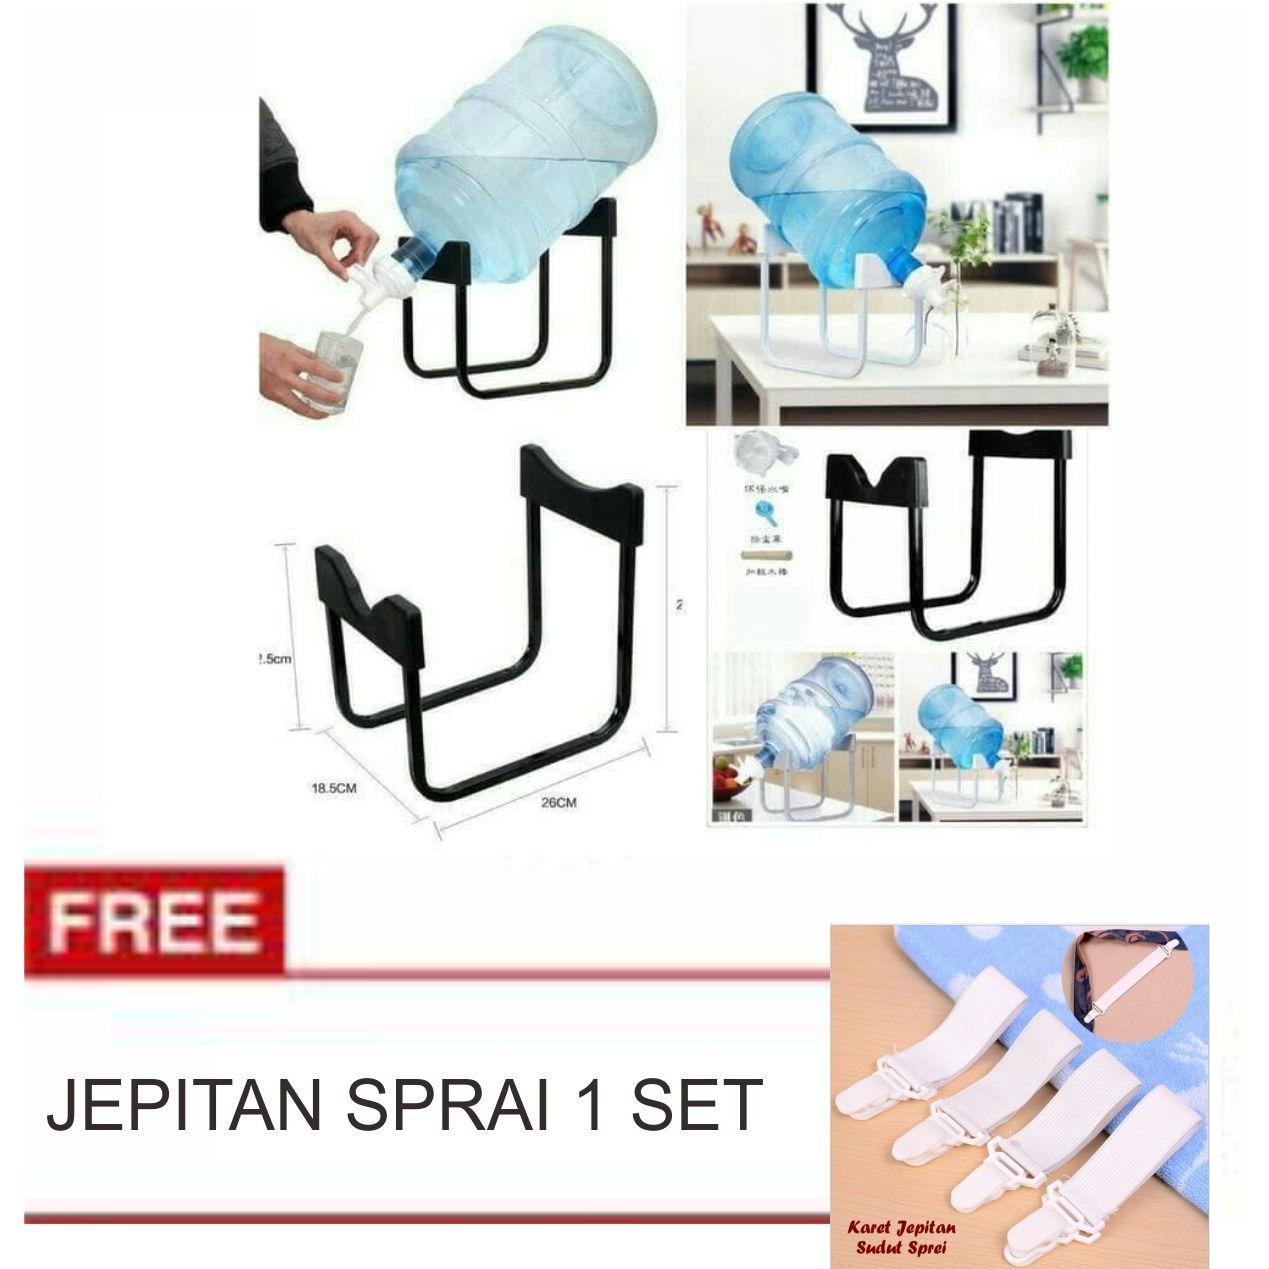 Lanjarjaya Rak Galon Tatakan Galon + Kran Air Galon / Dispenser Air Galon / Dispenser Minuman / Tatakan Aqua / Rak Besi Warna Random+jepitan sprai